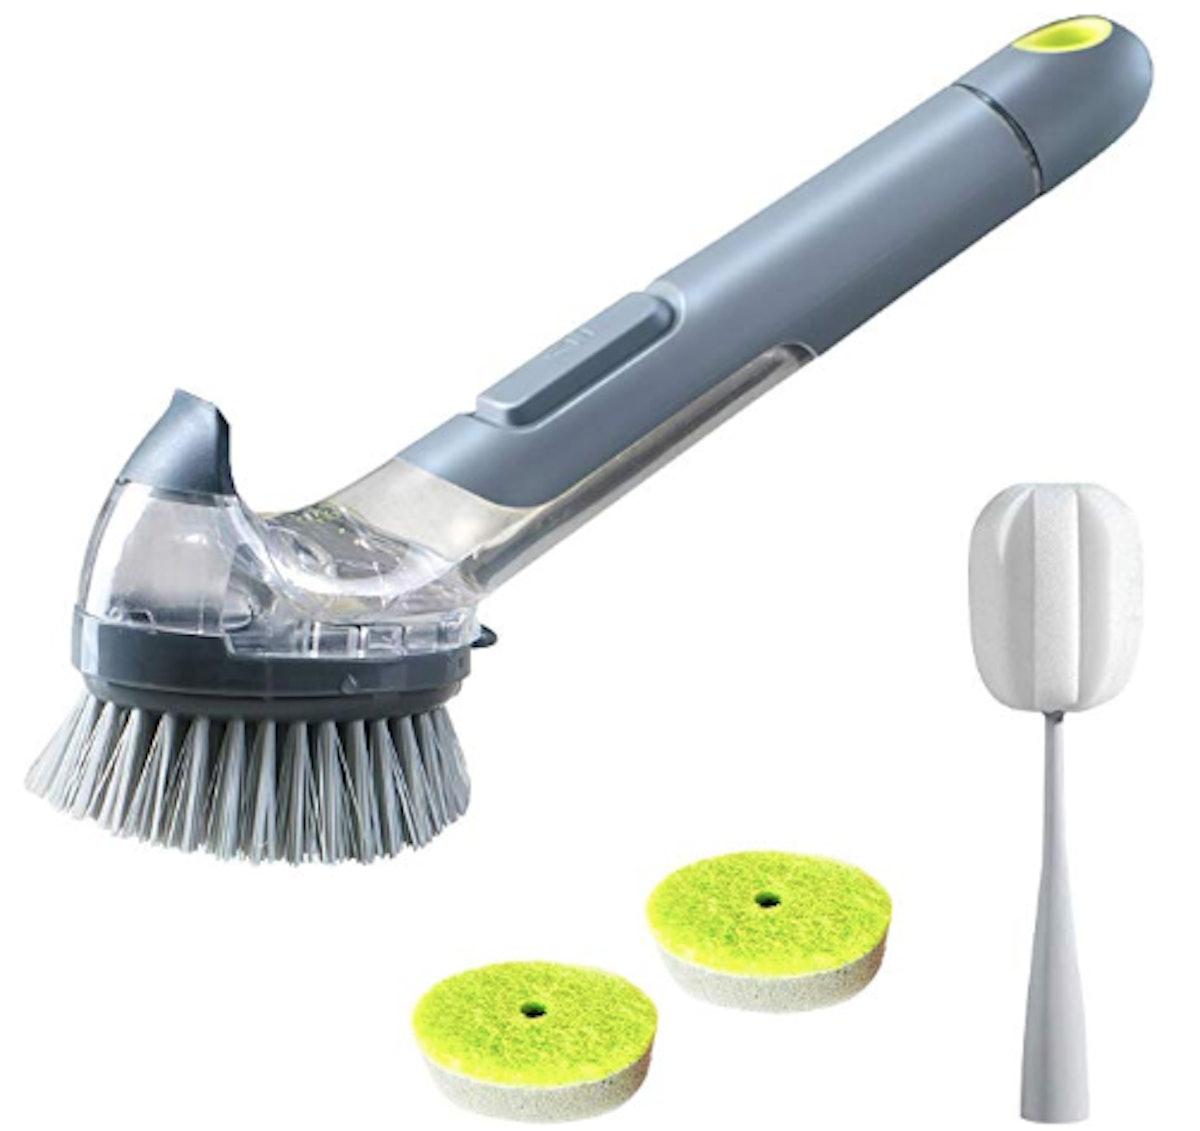 JEHONN Dish Brush with Soap Dispenser